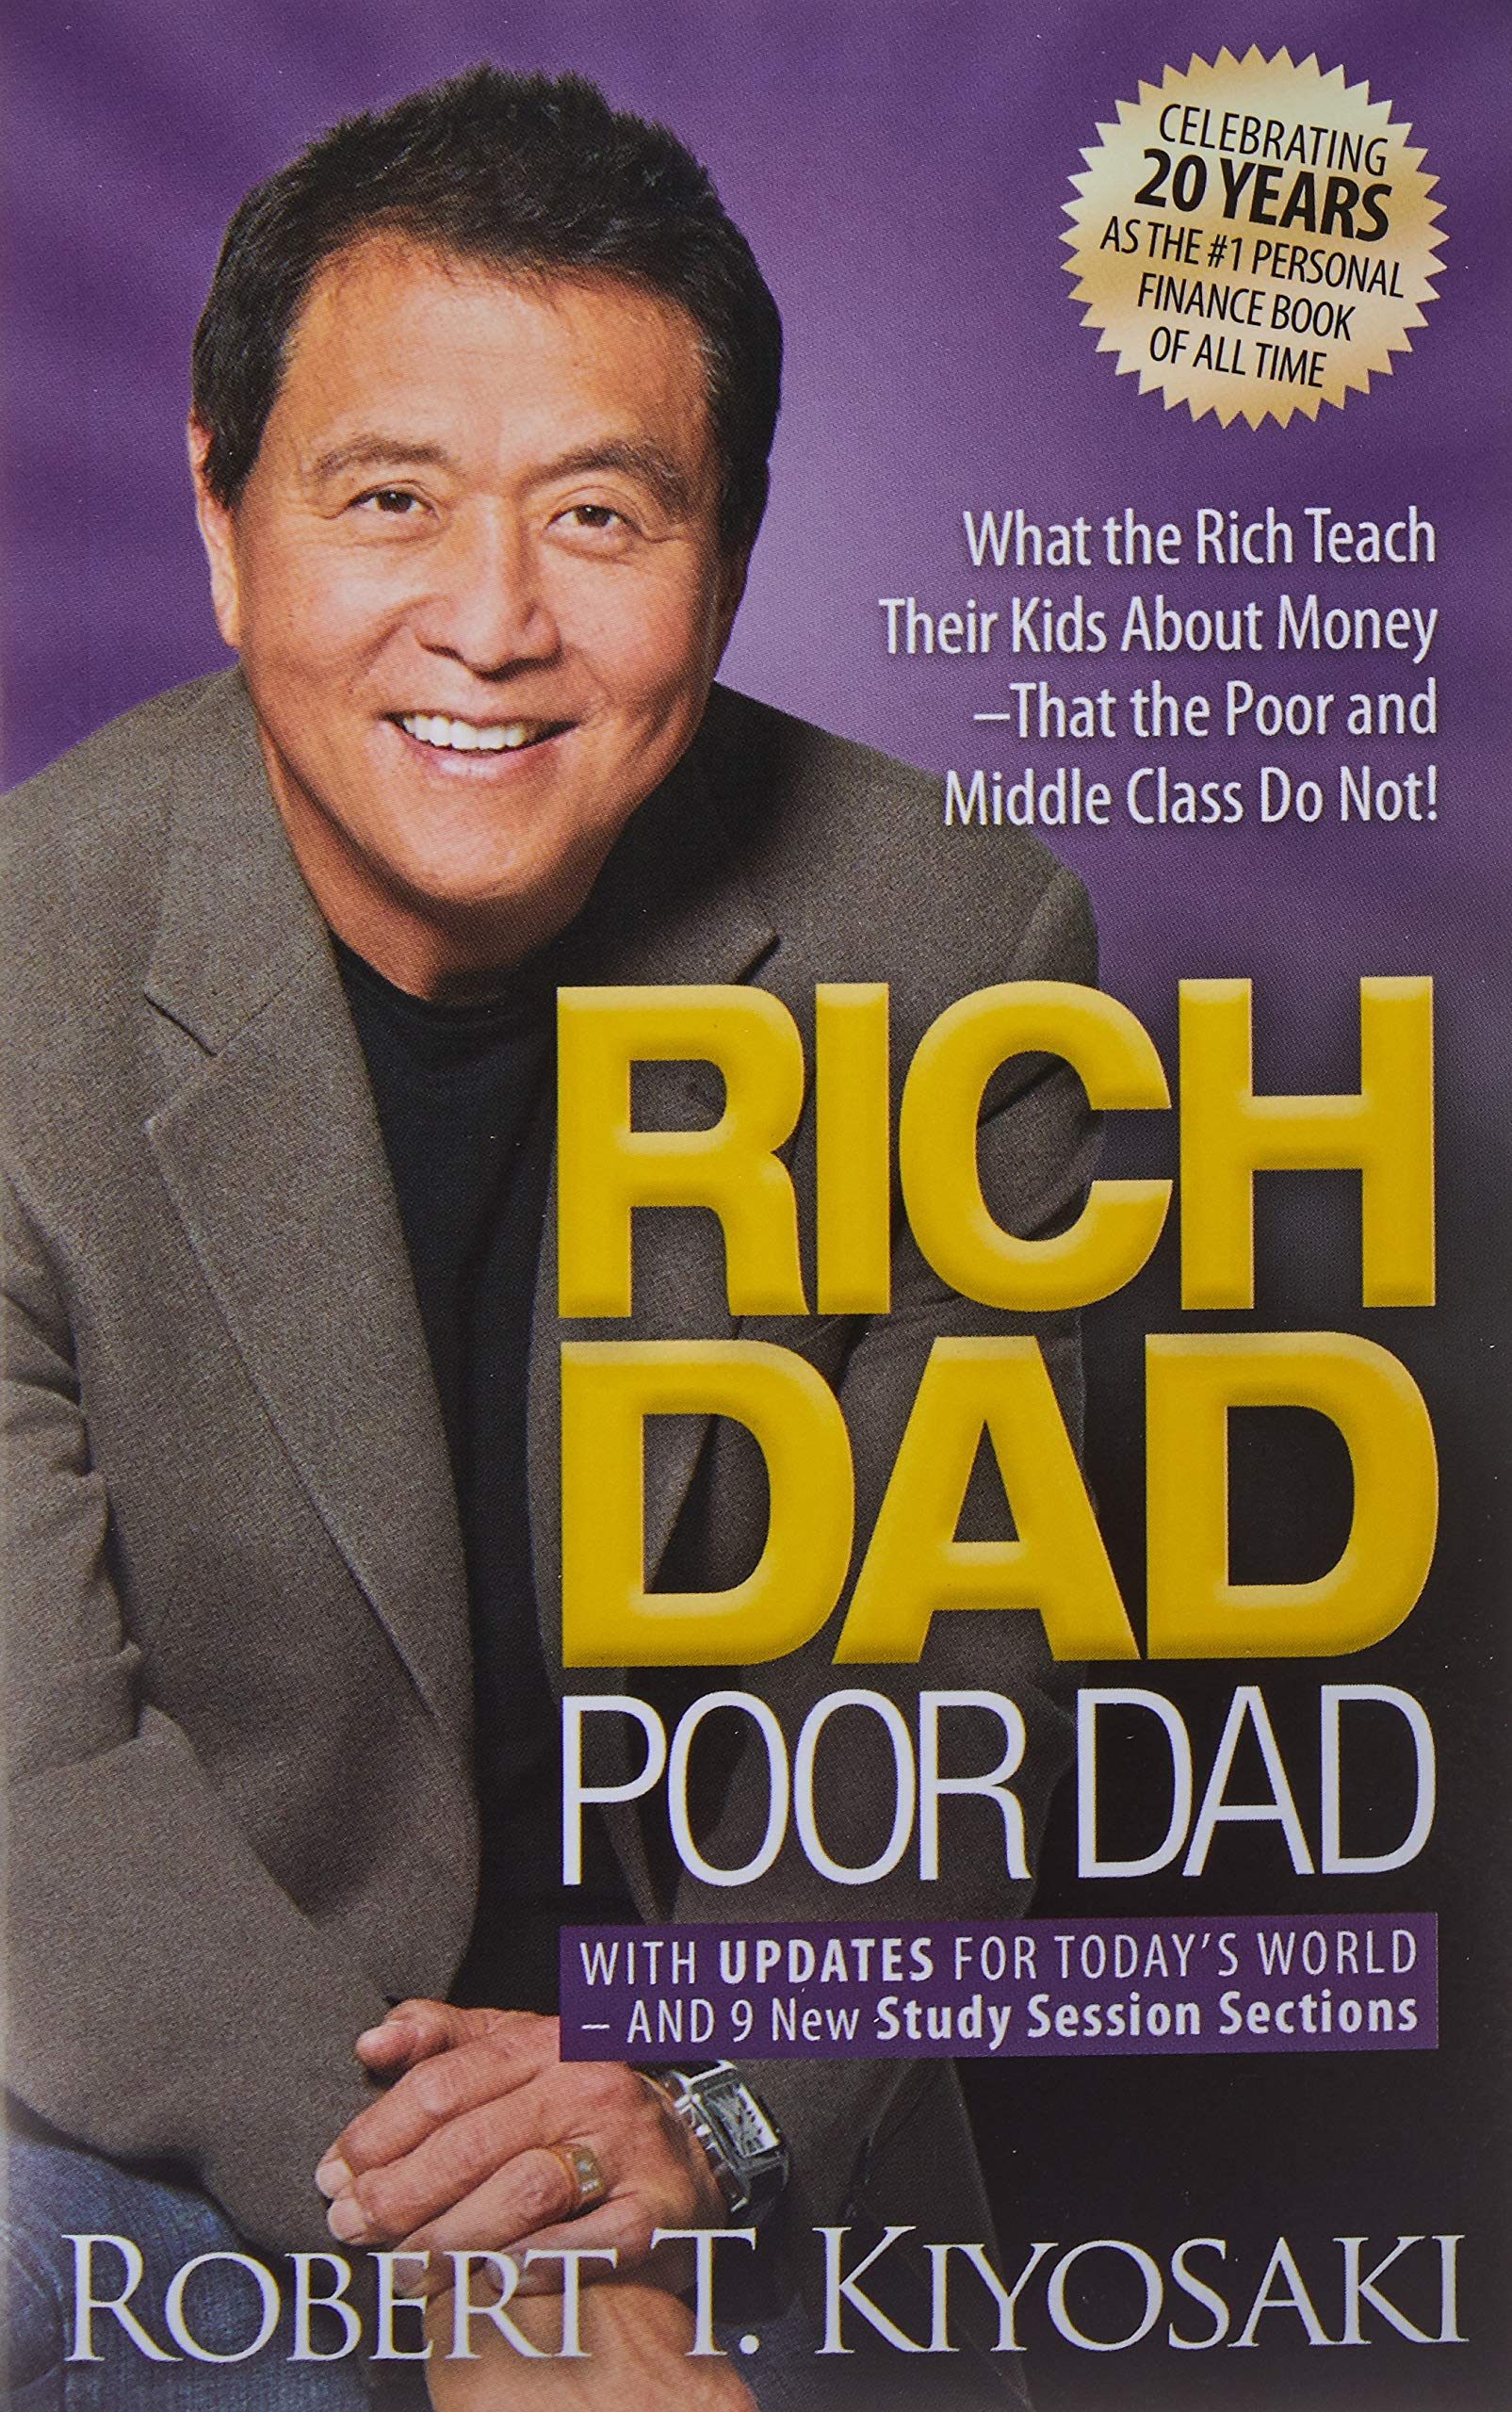 richdad_poordad